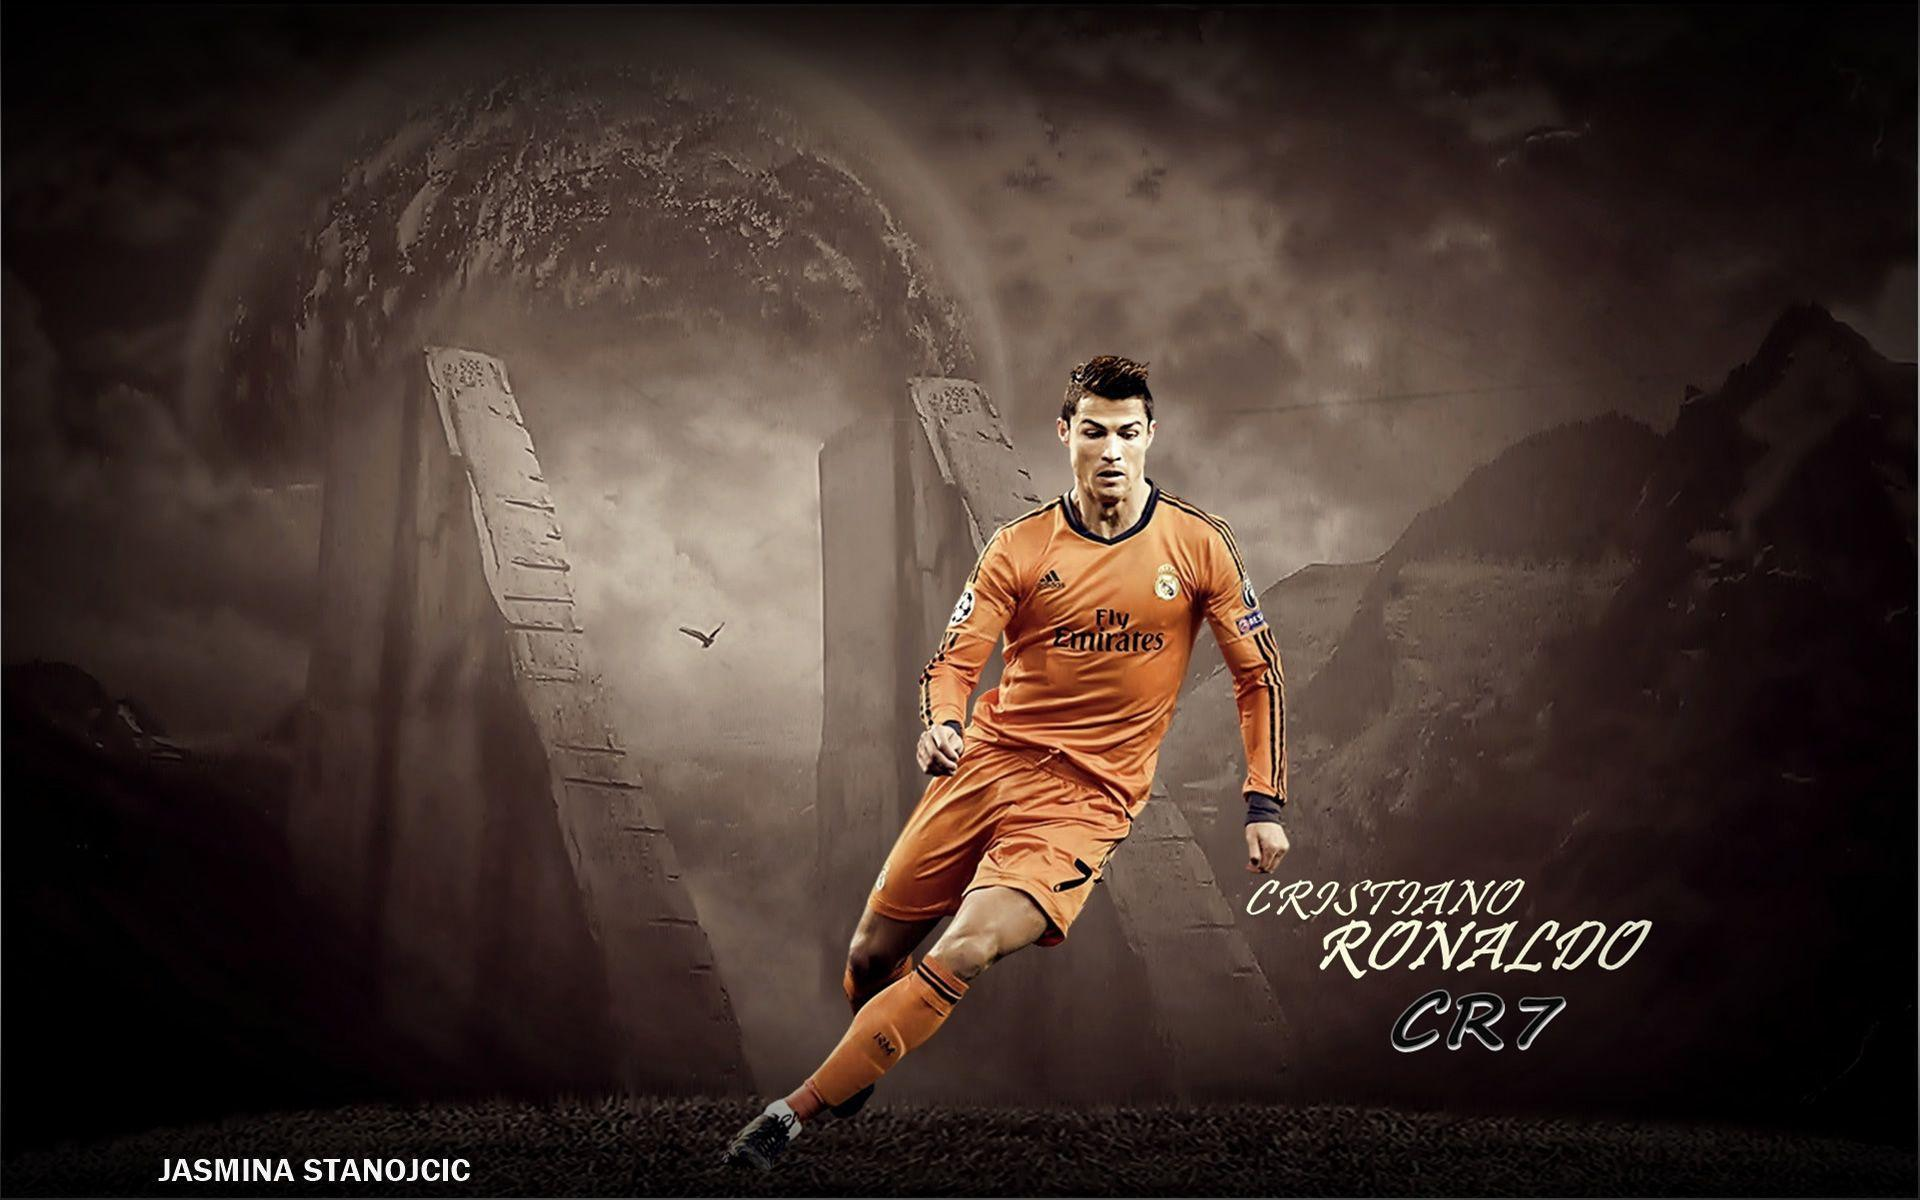 Cristiano Ronaldo Wallpapers - CR7 HD Wallpaper